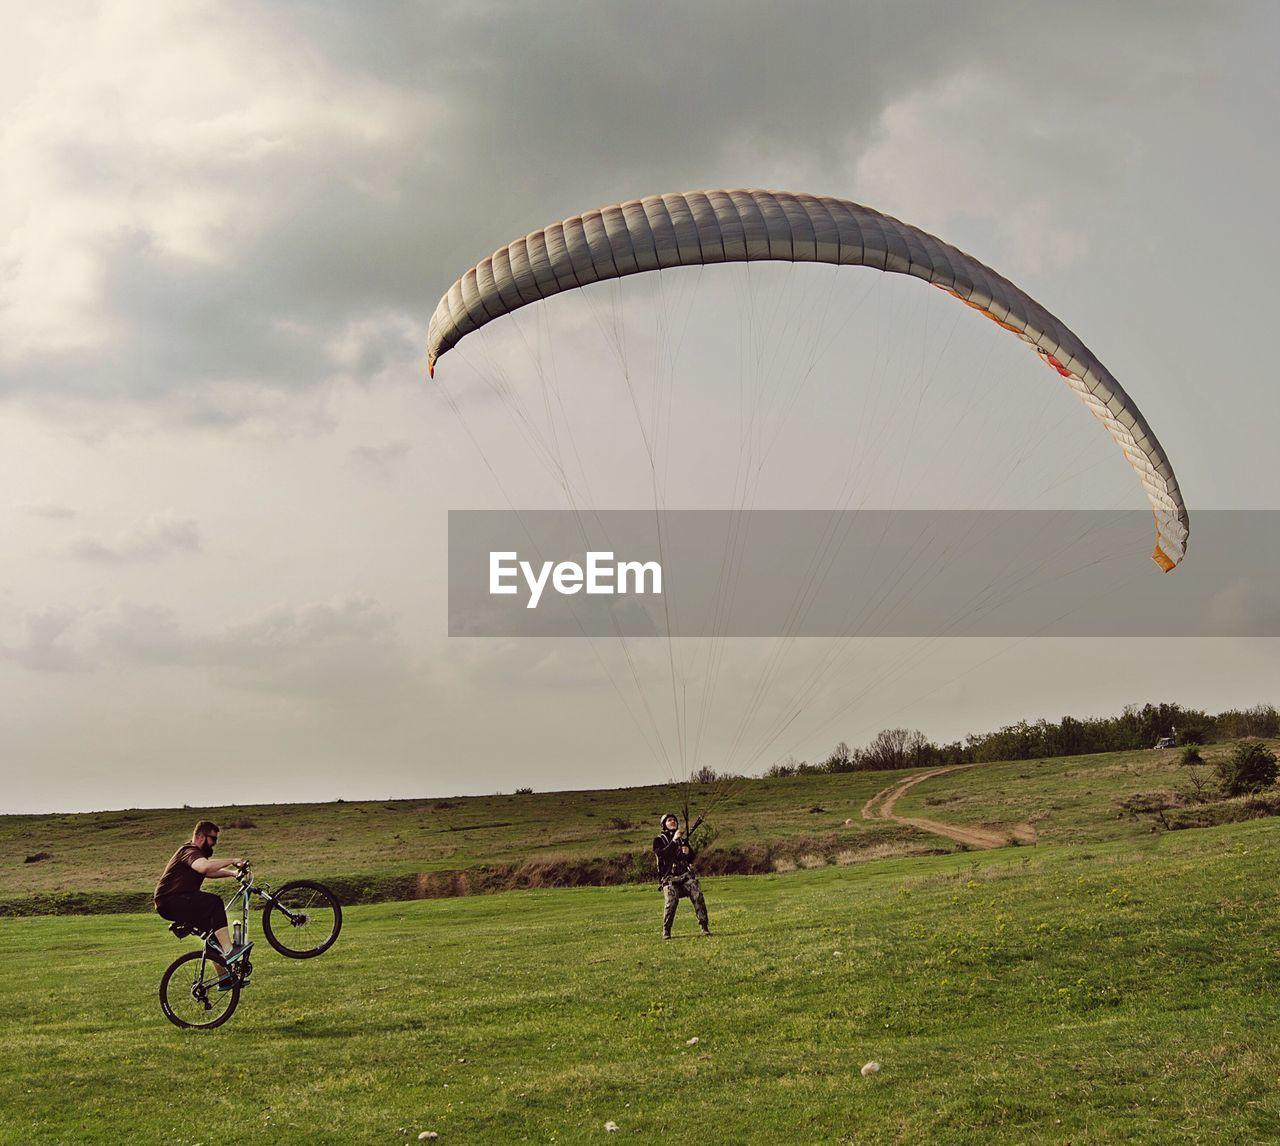 Bmx biker and paraglider on field